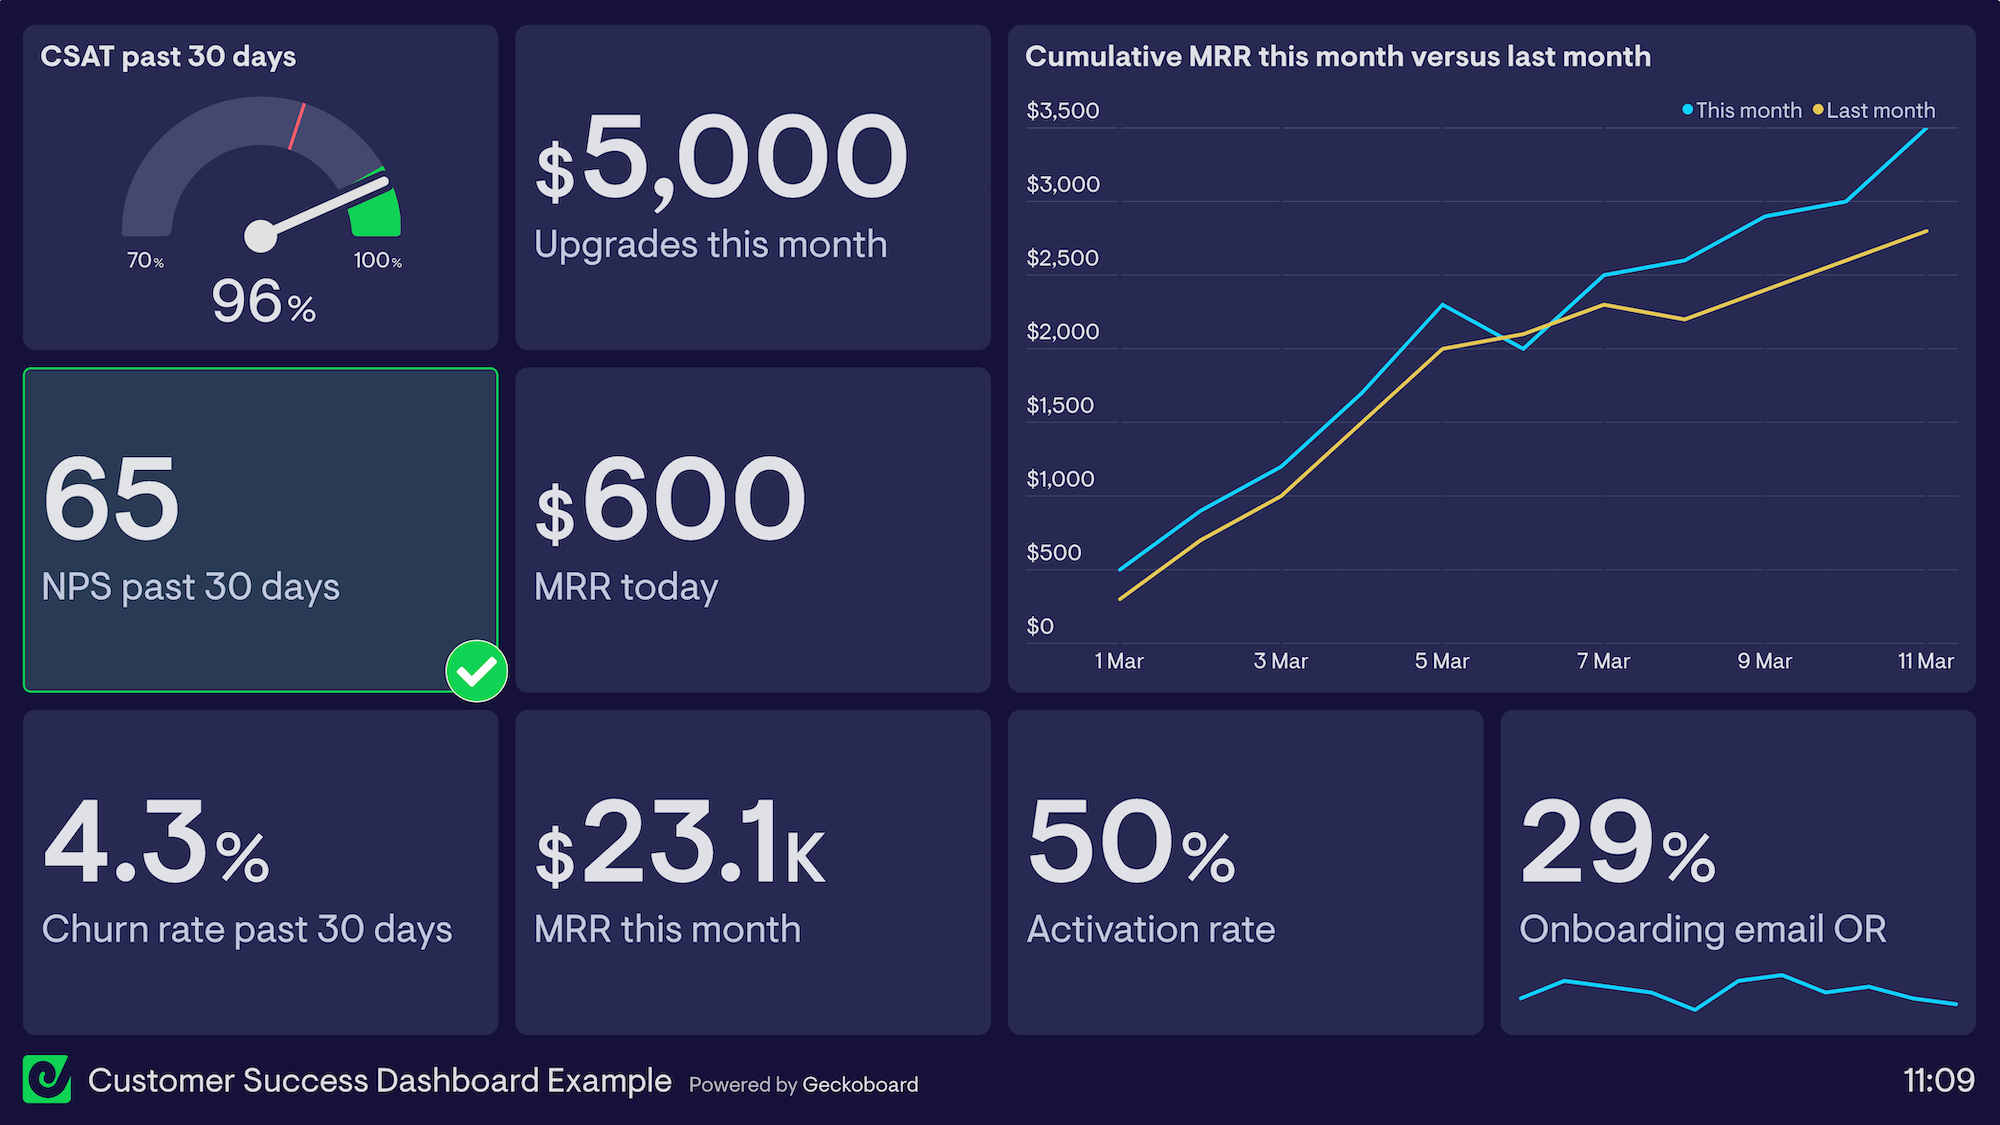 Customer Success Dashboard Example